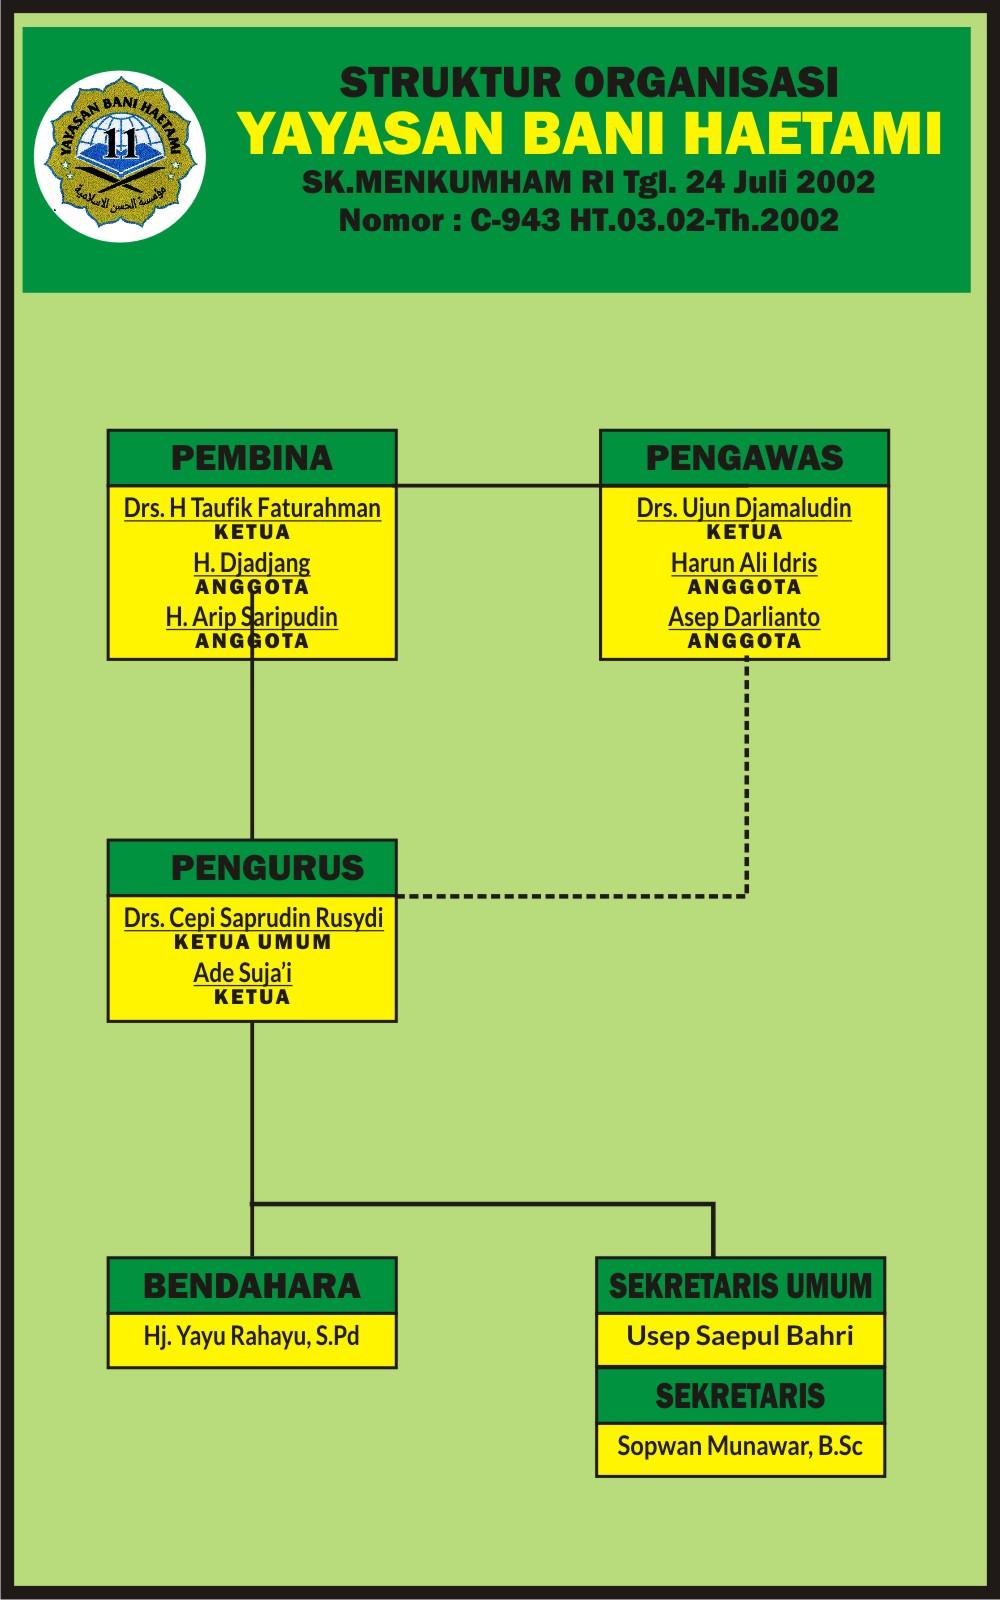 Download Desain Struktur Organisasi Cdr : download, desain, struktur, organisasi, Download, Contoh, Struktur, Organisasi, Yayasan.cdr, KARYAKU